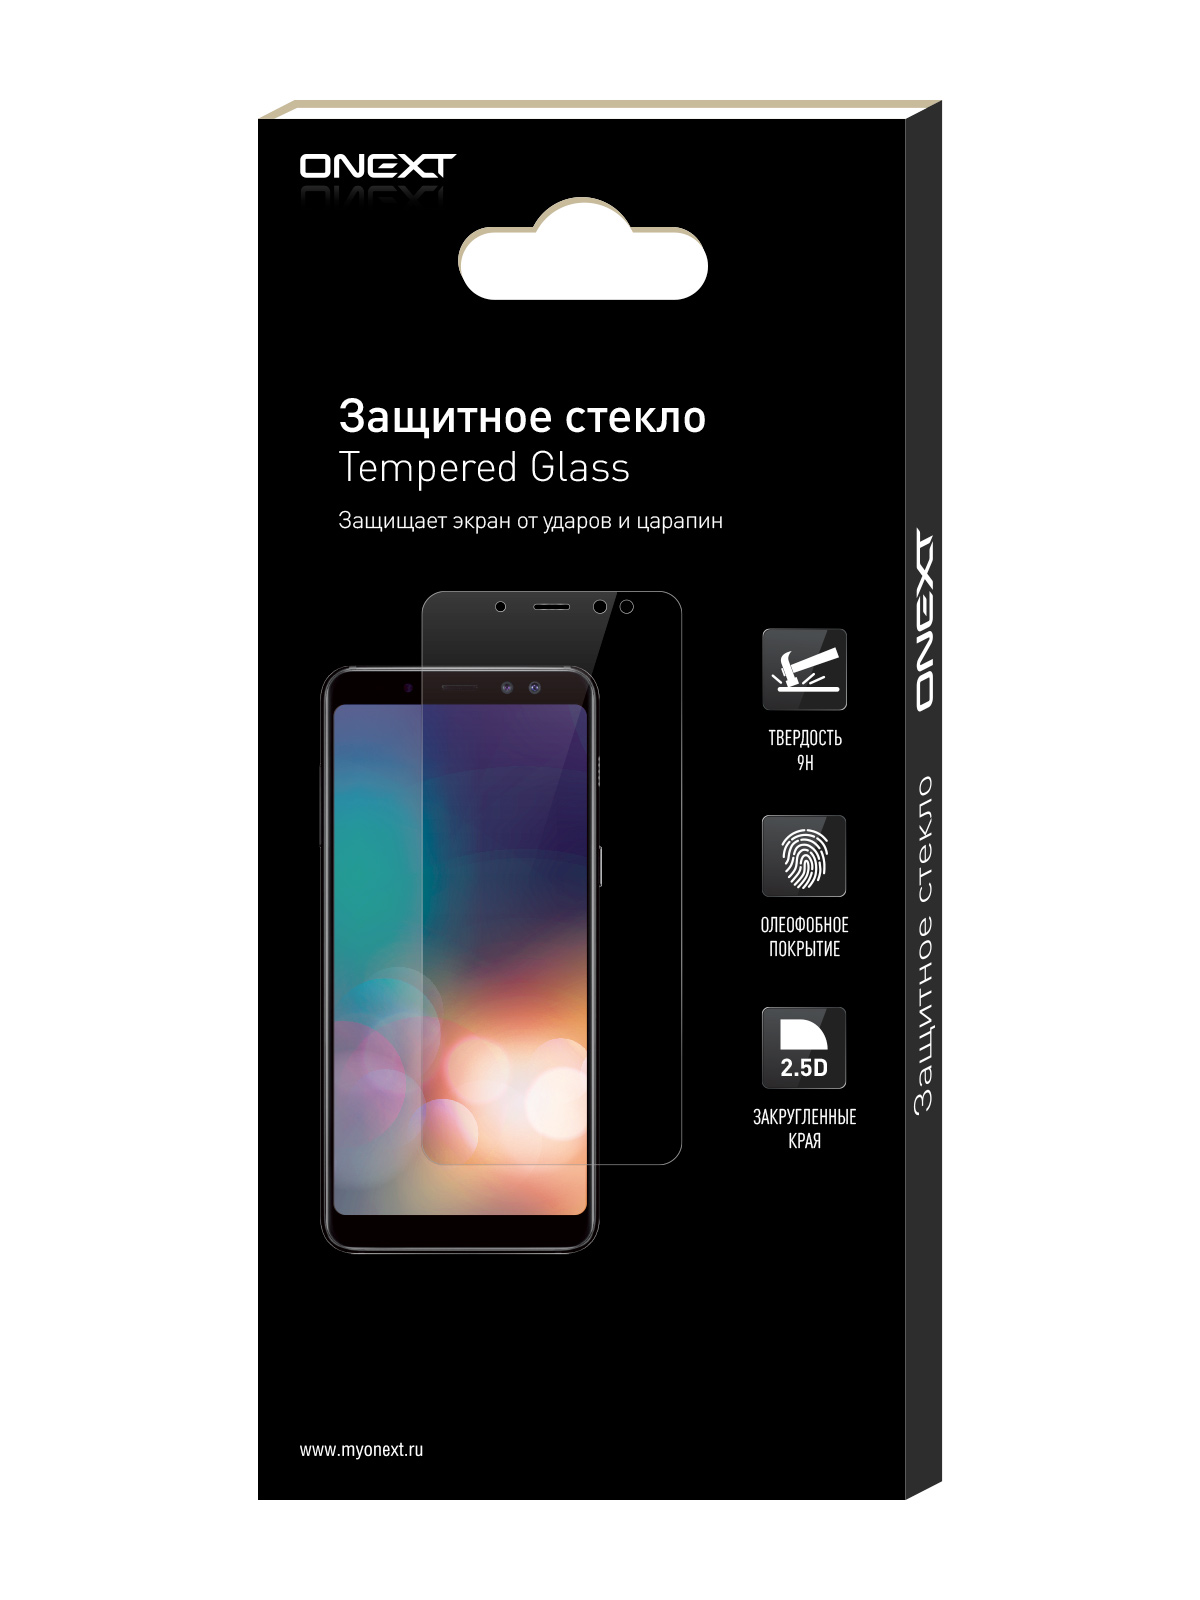 Защитное стекло ONEXT HTC Desire 820 защитное стекло onext htc u play